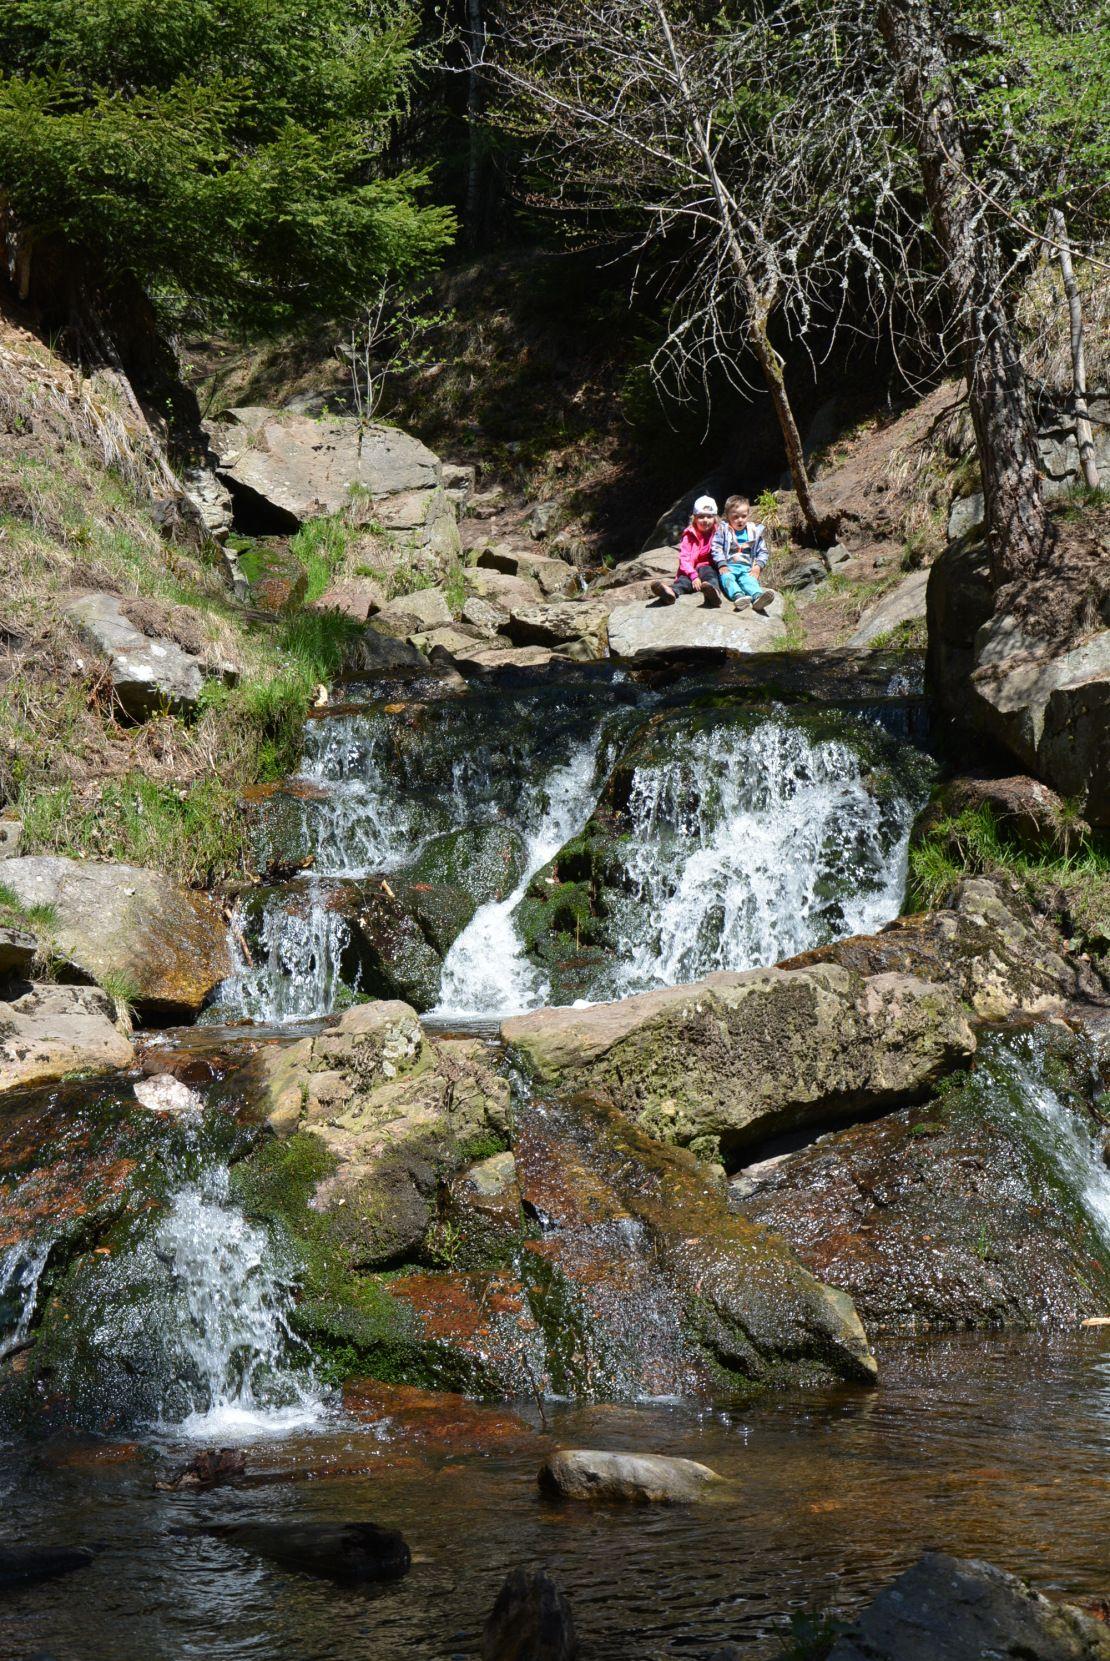 Arboretum Lesná a Helenčiny vodopády – Krušné hory s dětmi – Už tam budem?